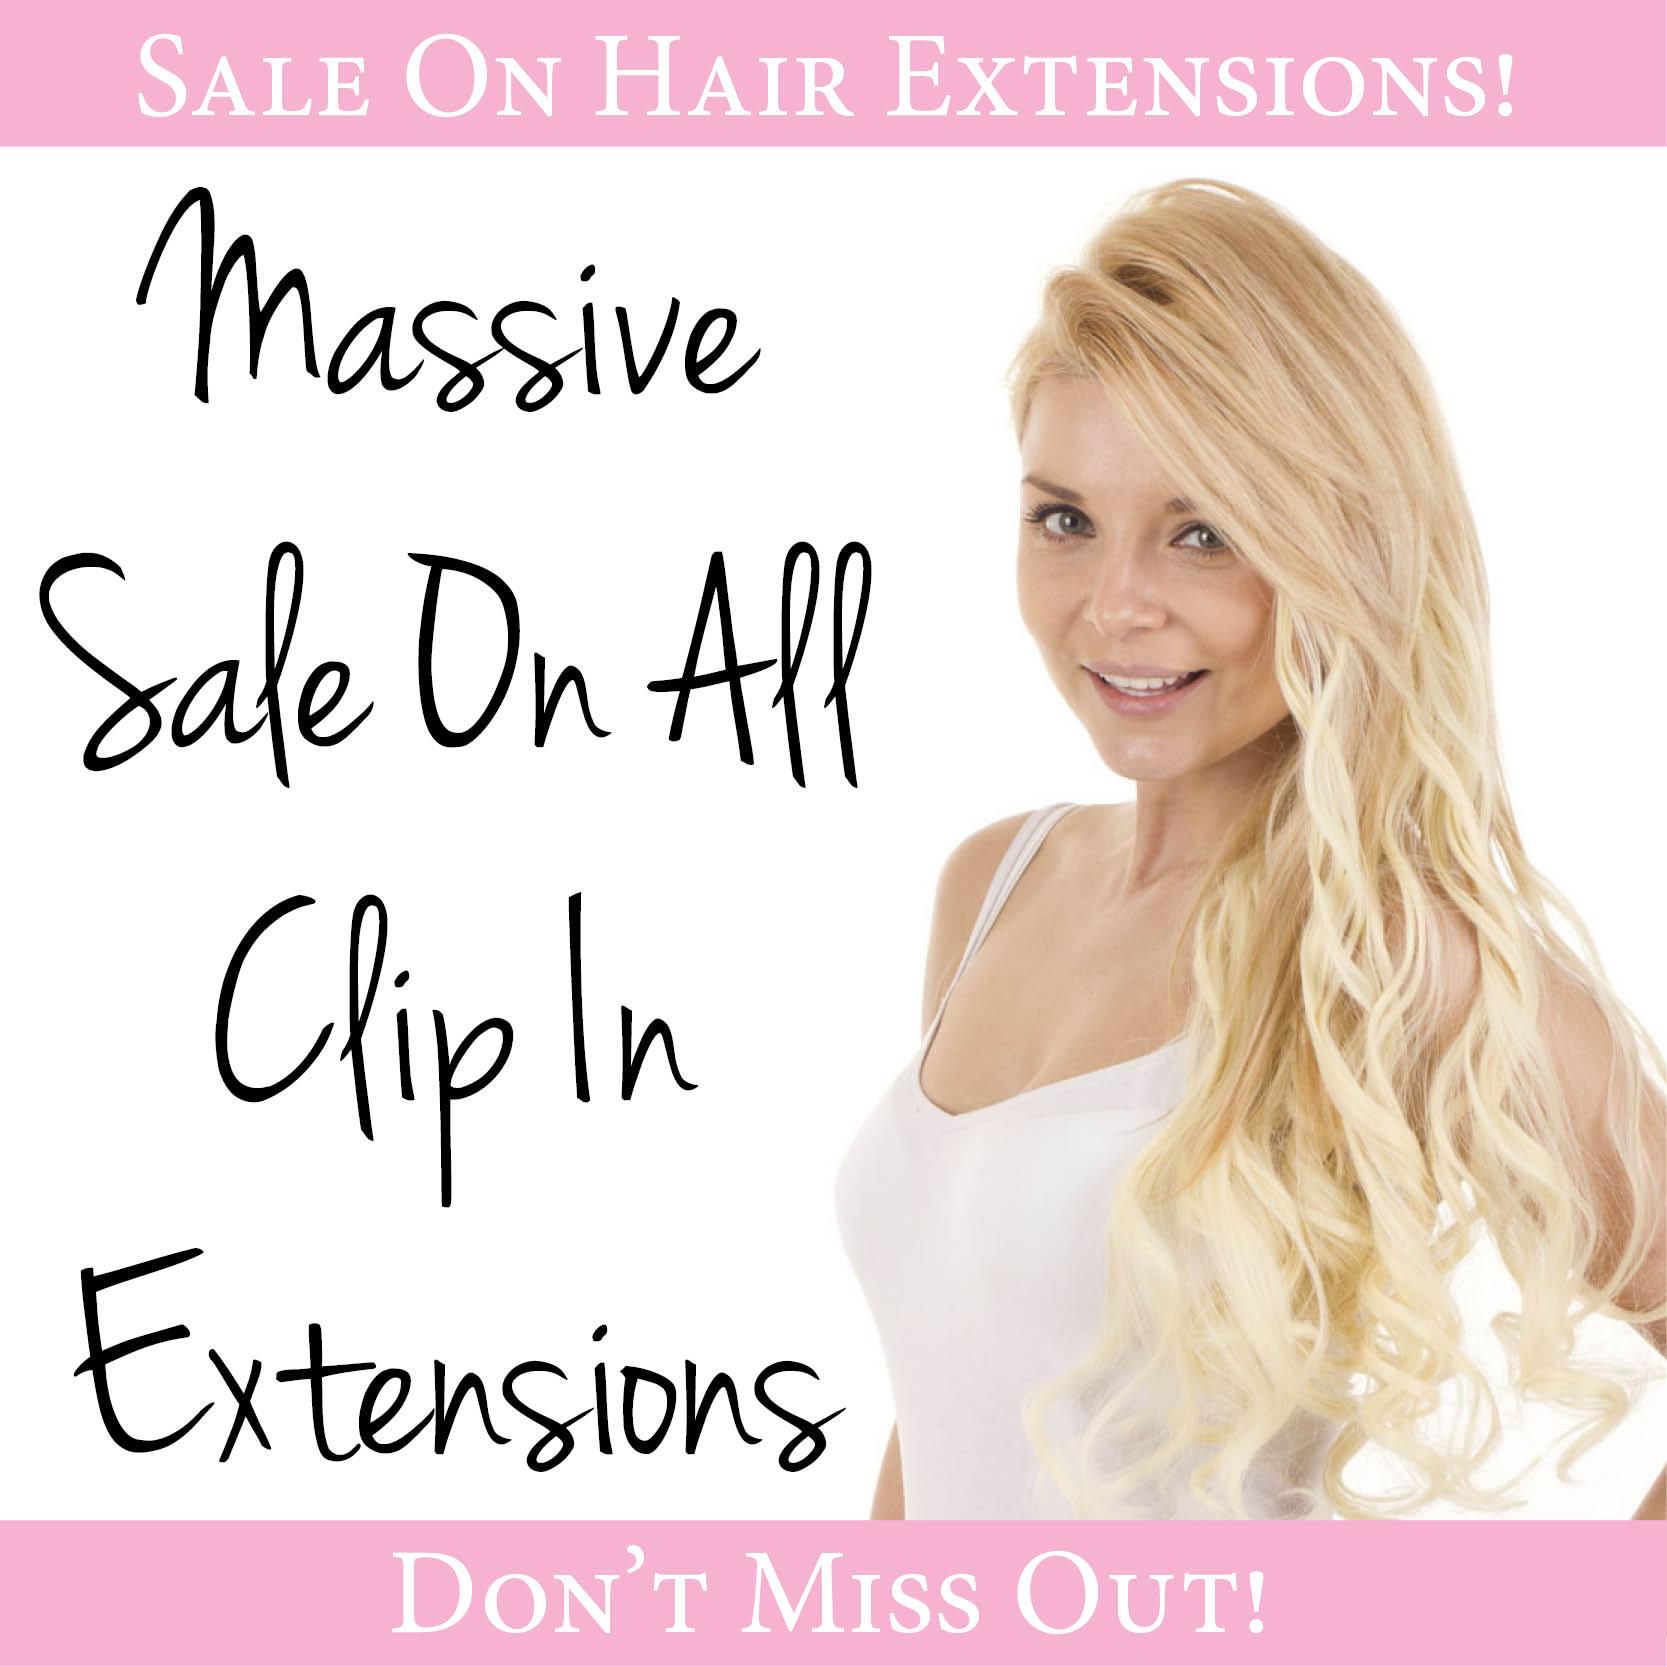 hair-extension-banner-deal.jpg